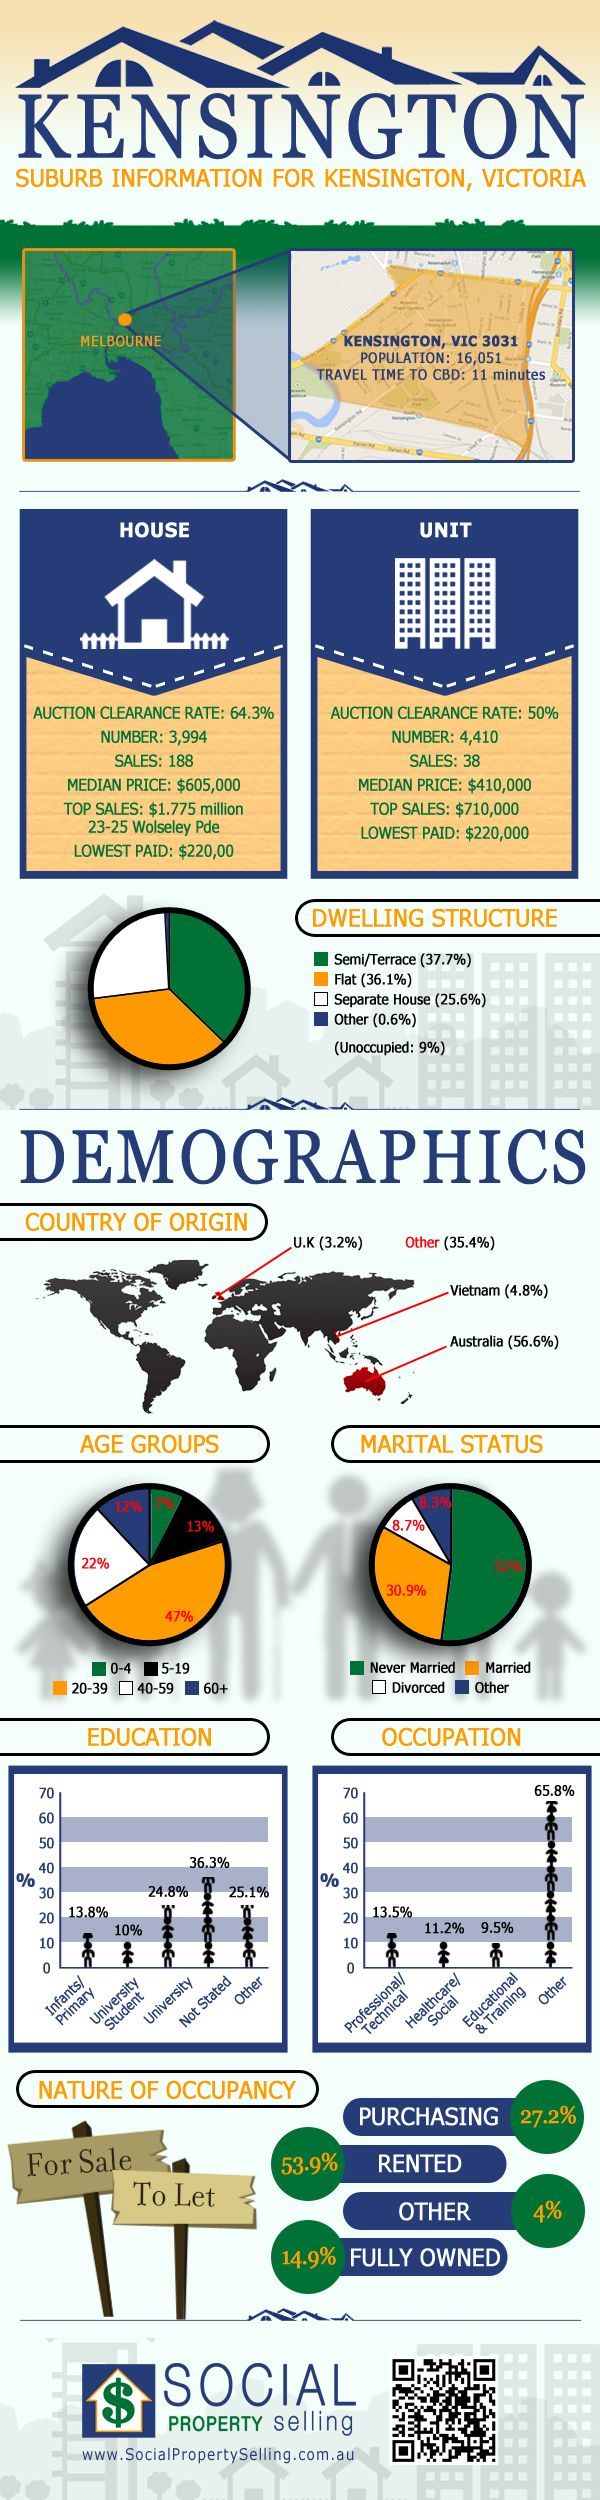 Kensington Victoria suburb demographics by Social Property Selling Kensington Suburb Profile